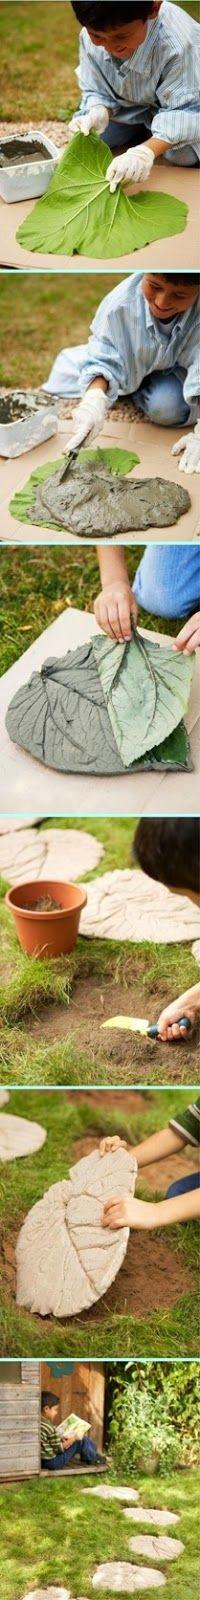 How to Make a Decorative Garden Path